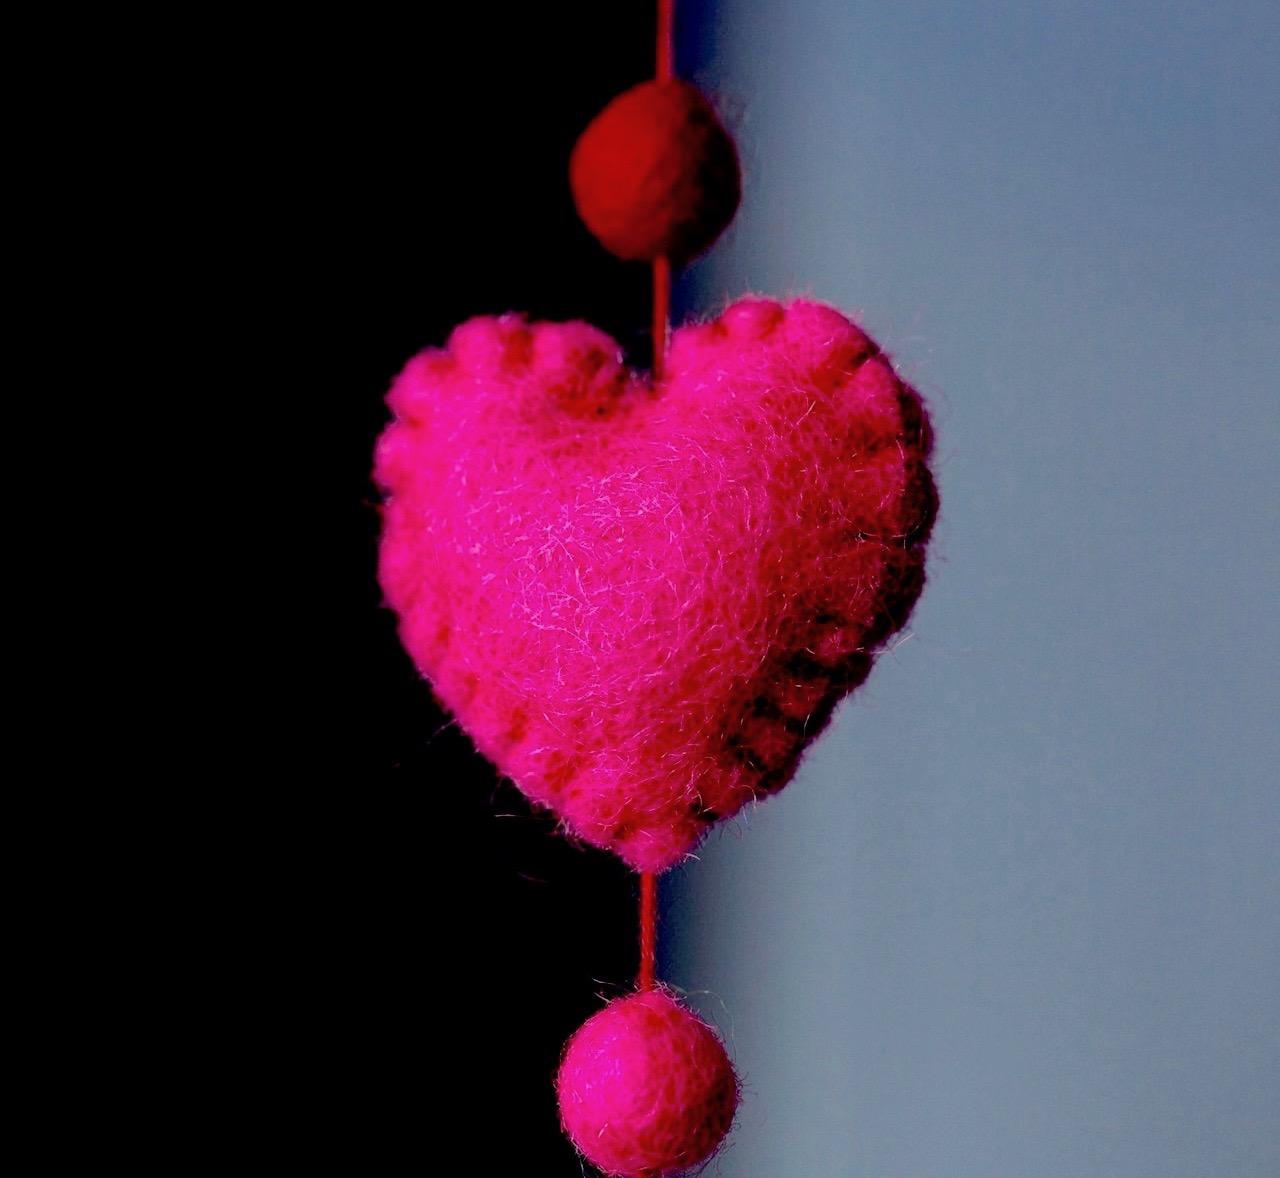 Fuschia pink heart made of felt hanging against a dark background